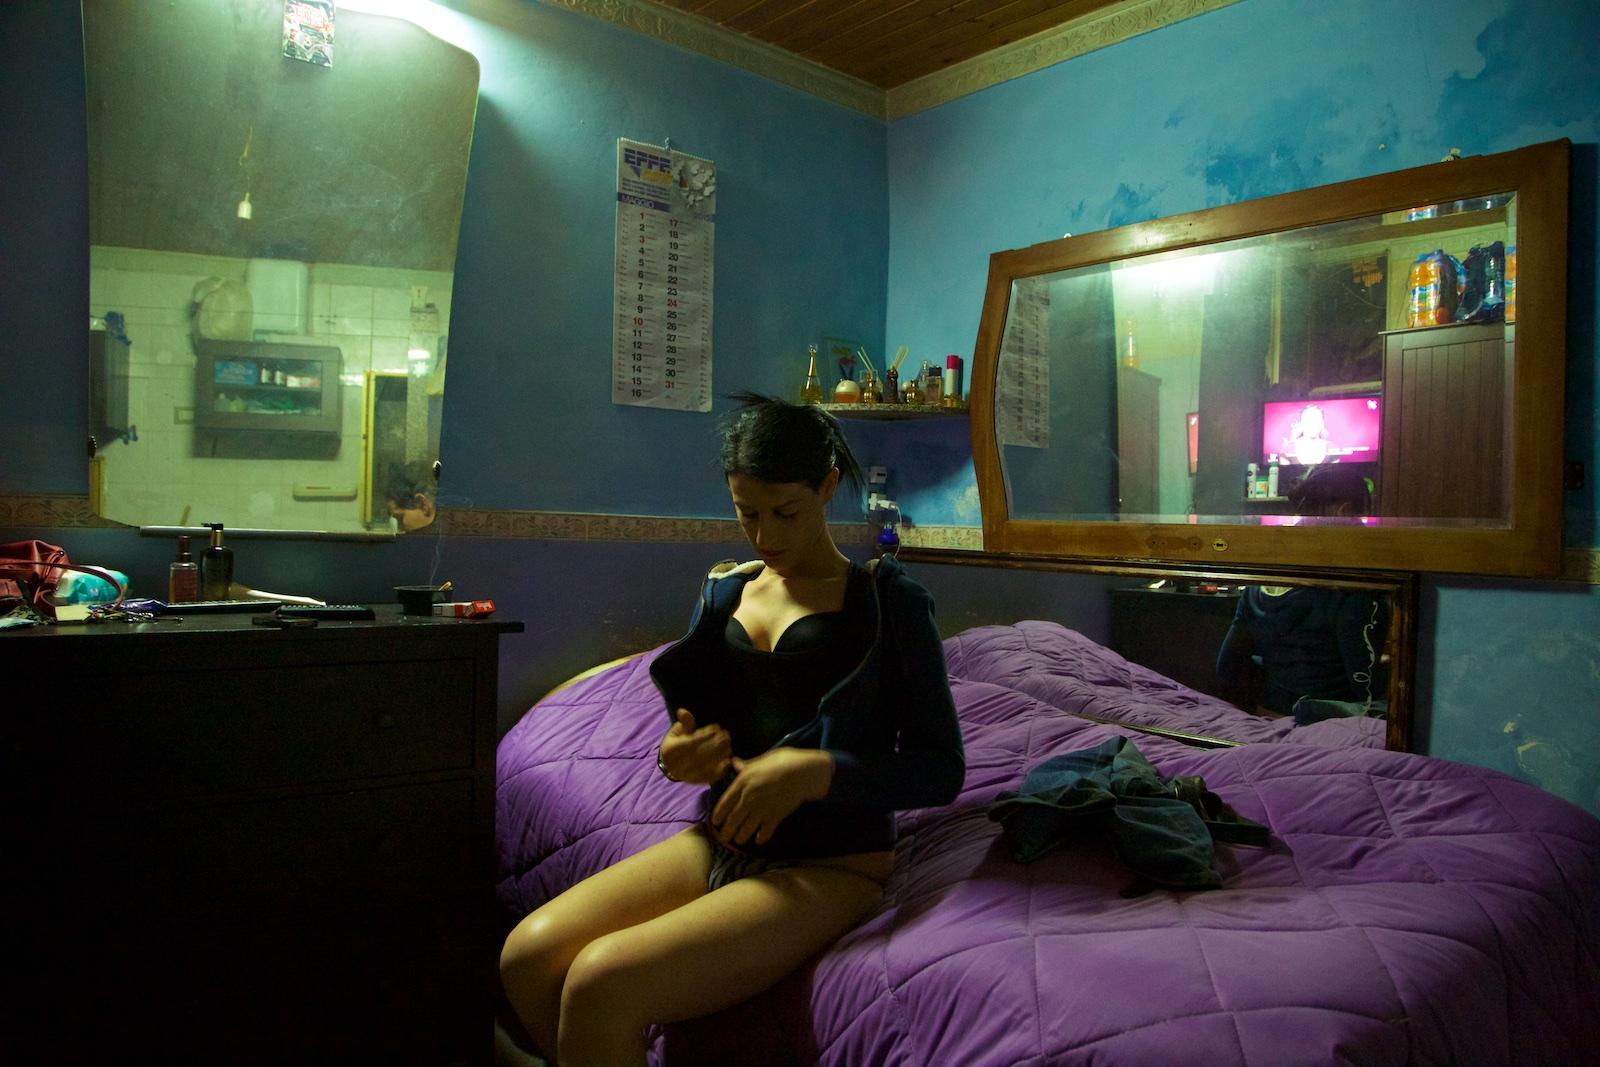 trans-agata-catania-san-berillo-sicilia-sicily-denis-bosnic-transgender-trans-photography-.jpg